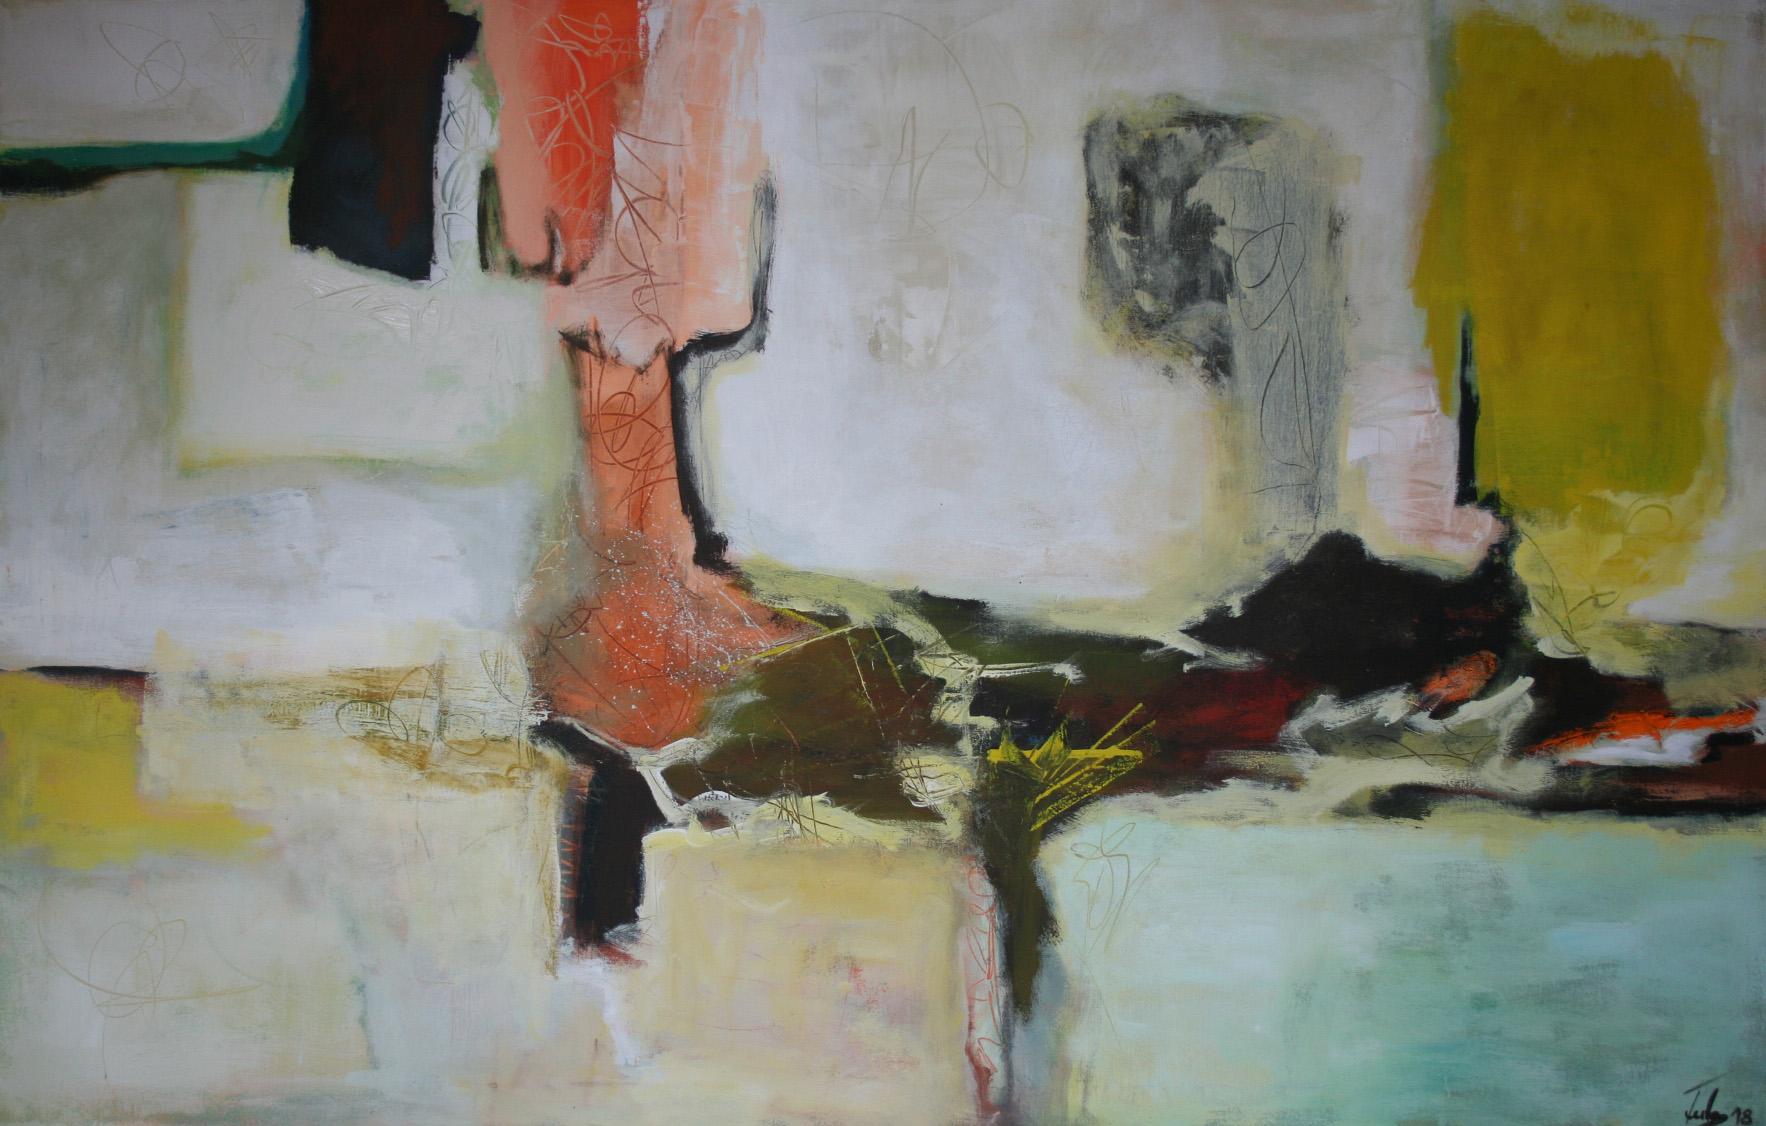 Ohne Titel 1803, Öl und Acryl auf Leinwand, 90 x 140 cm